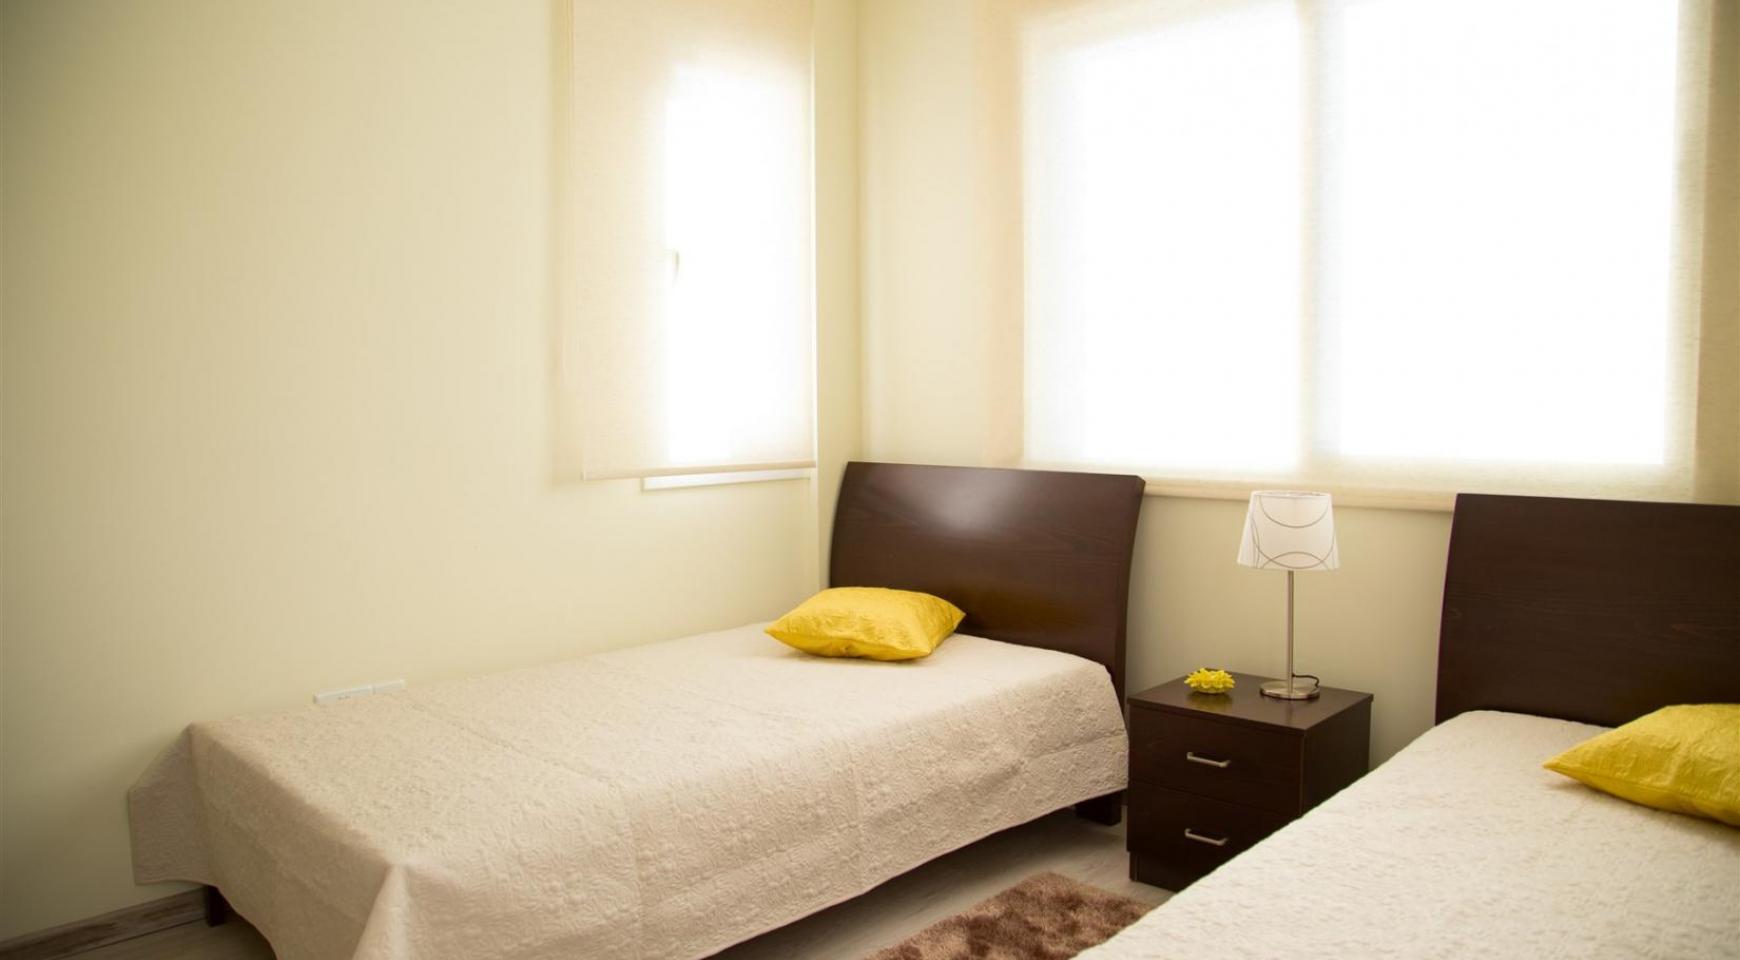 Luxury 2 Bedroom Apartment Christina 301 in the Tourist Area - 34